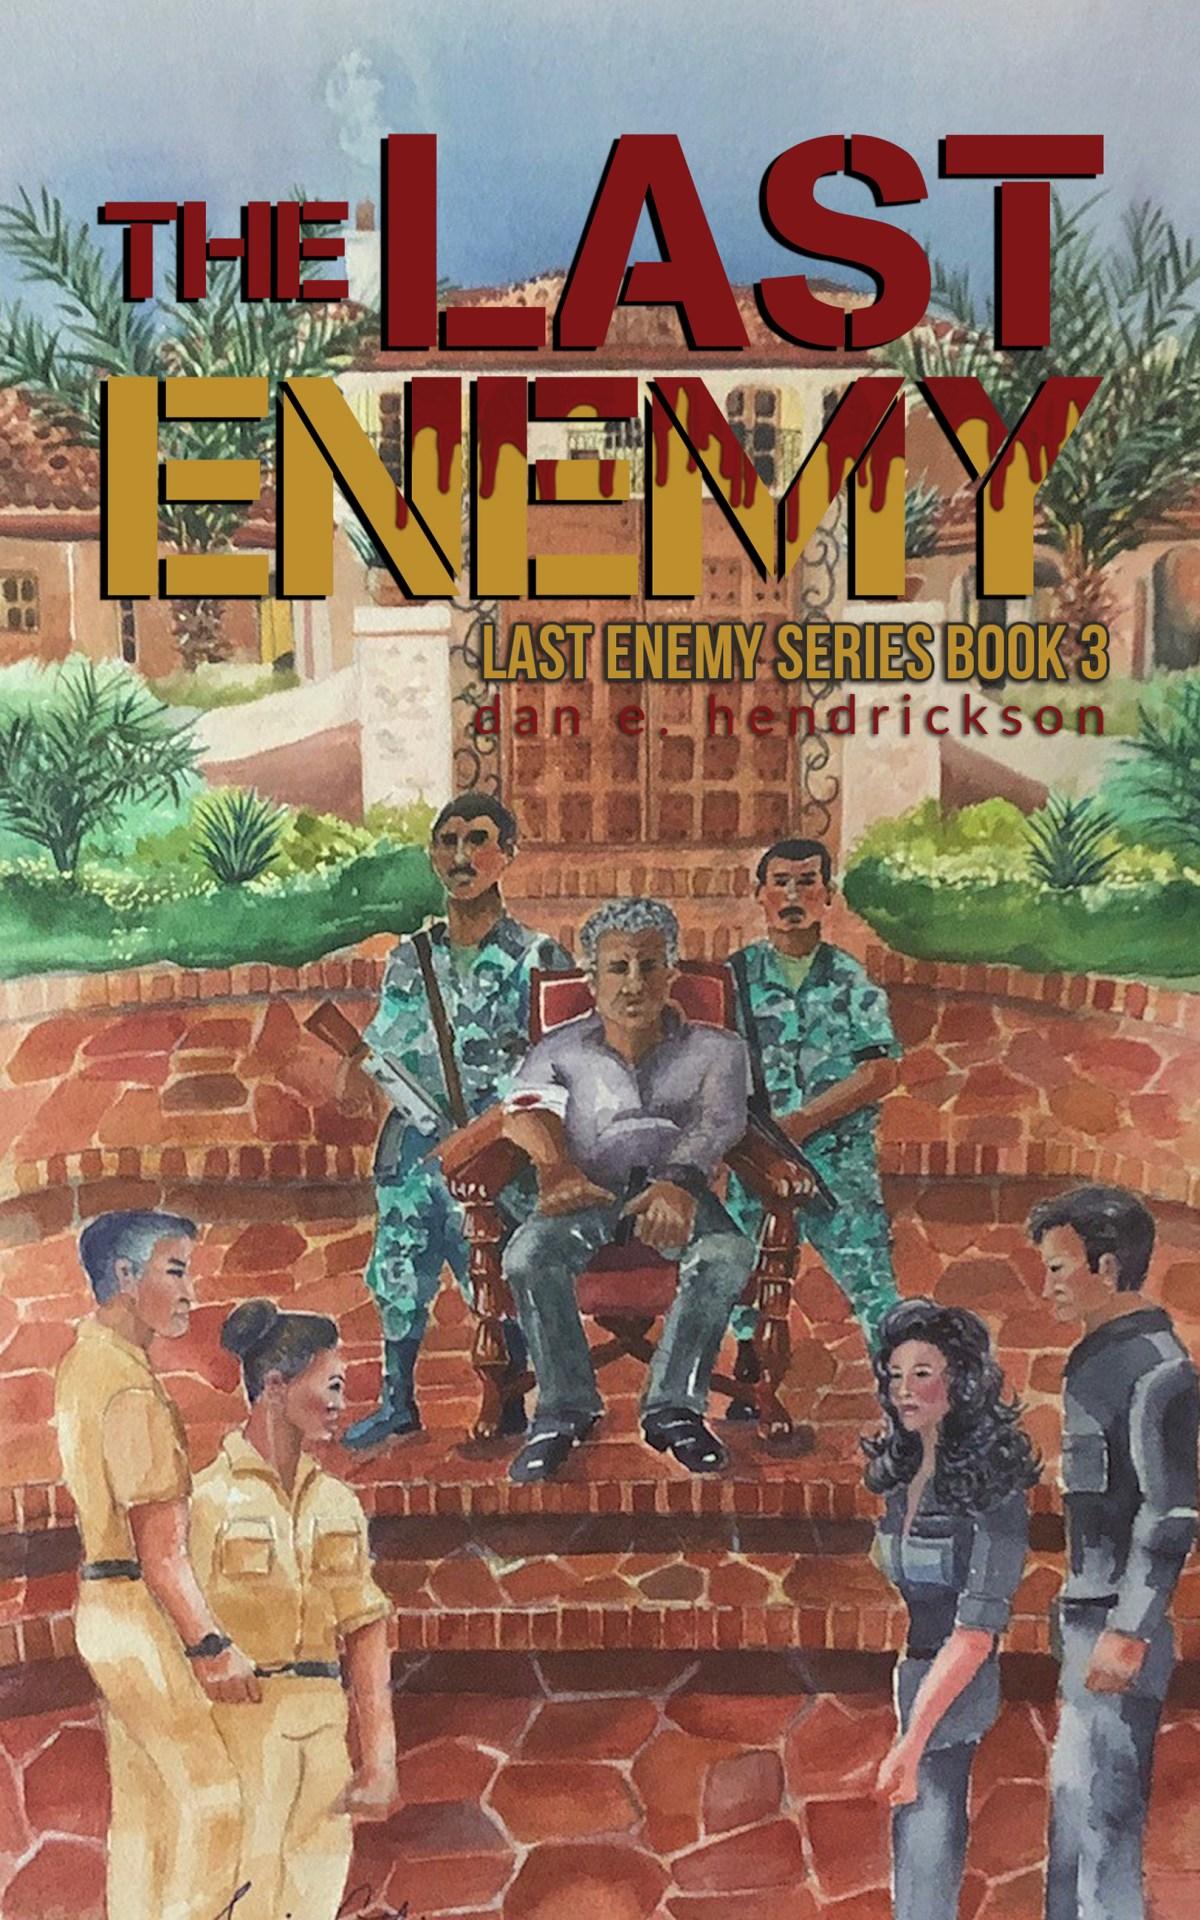 The Last Enemy Final ebook size